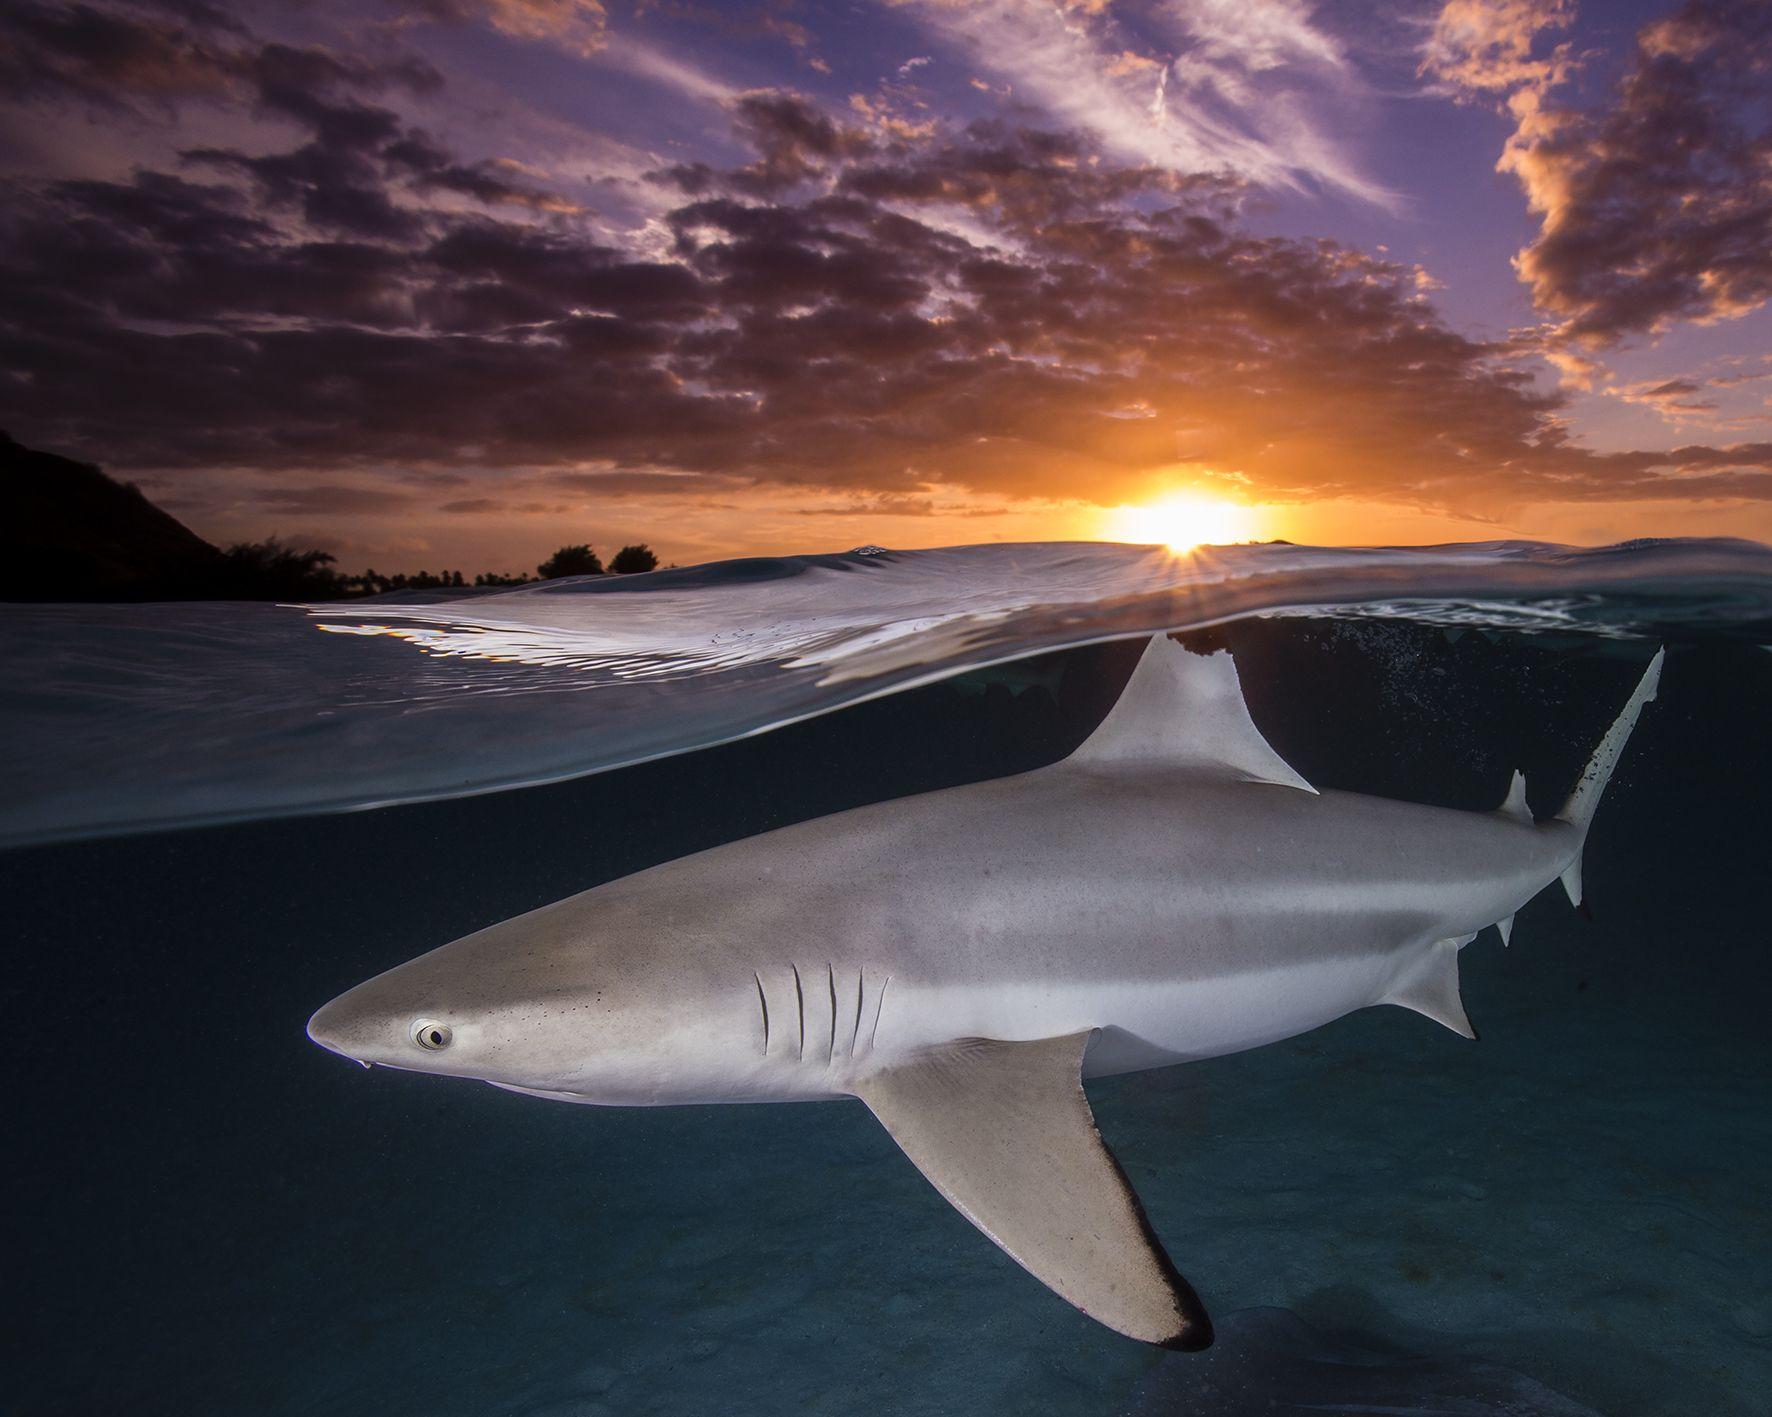 Renee-Capozzola-ocean-photography-awards